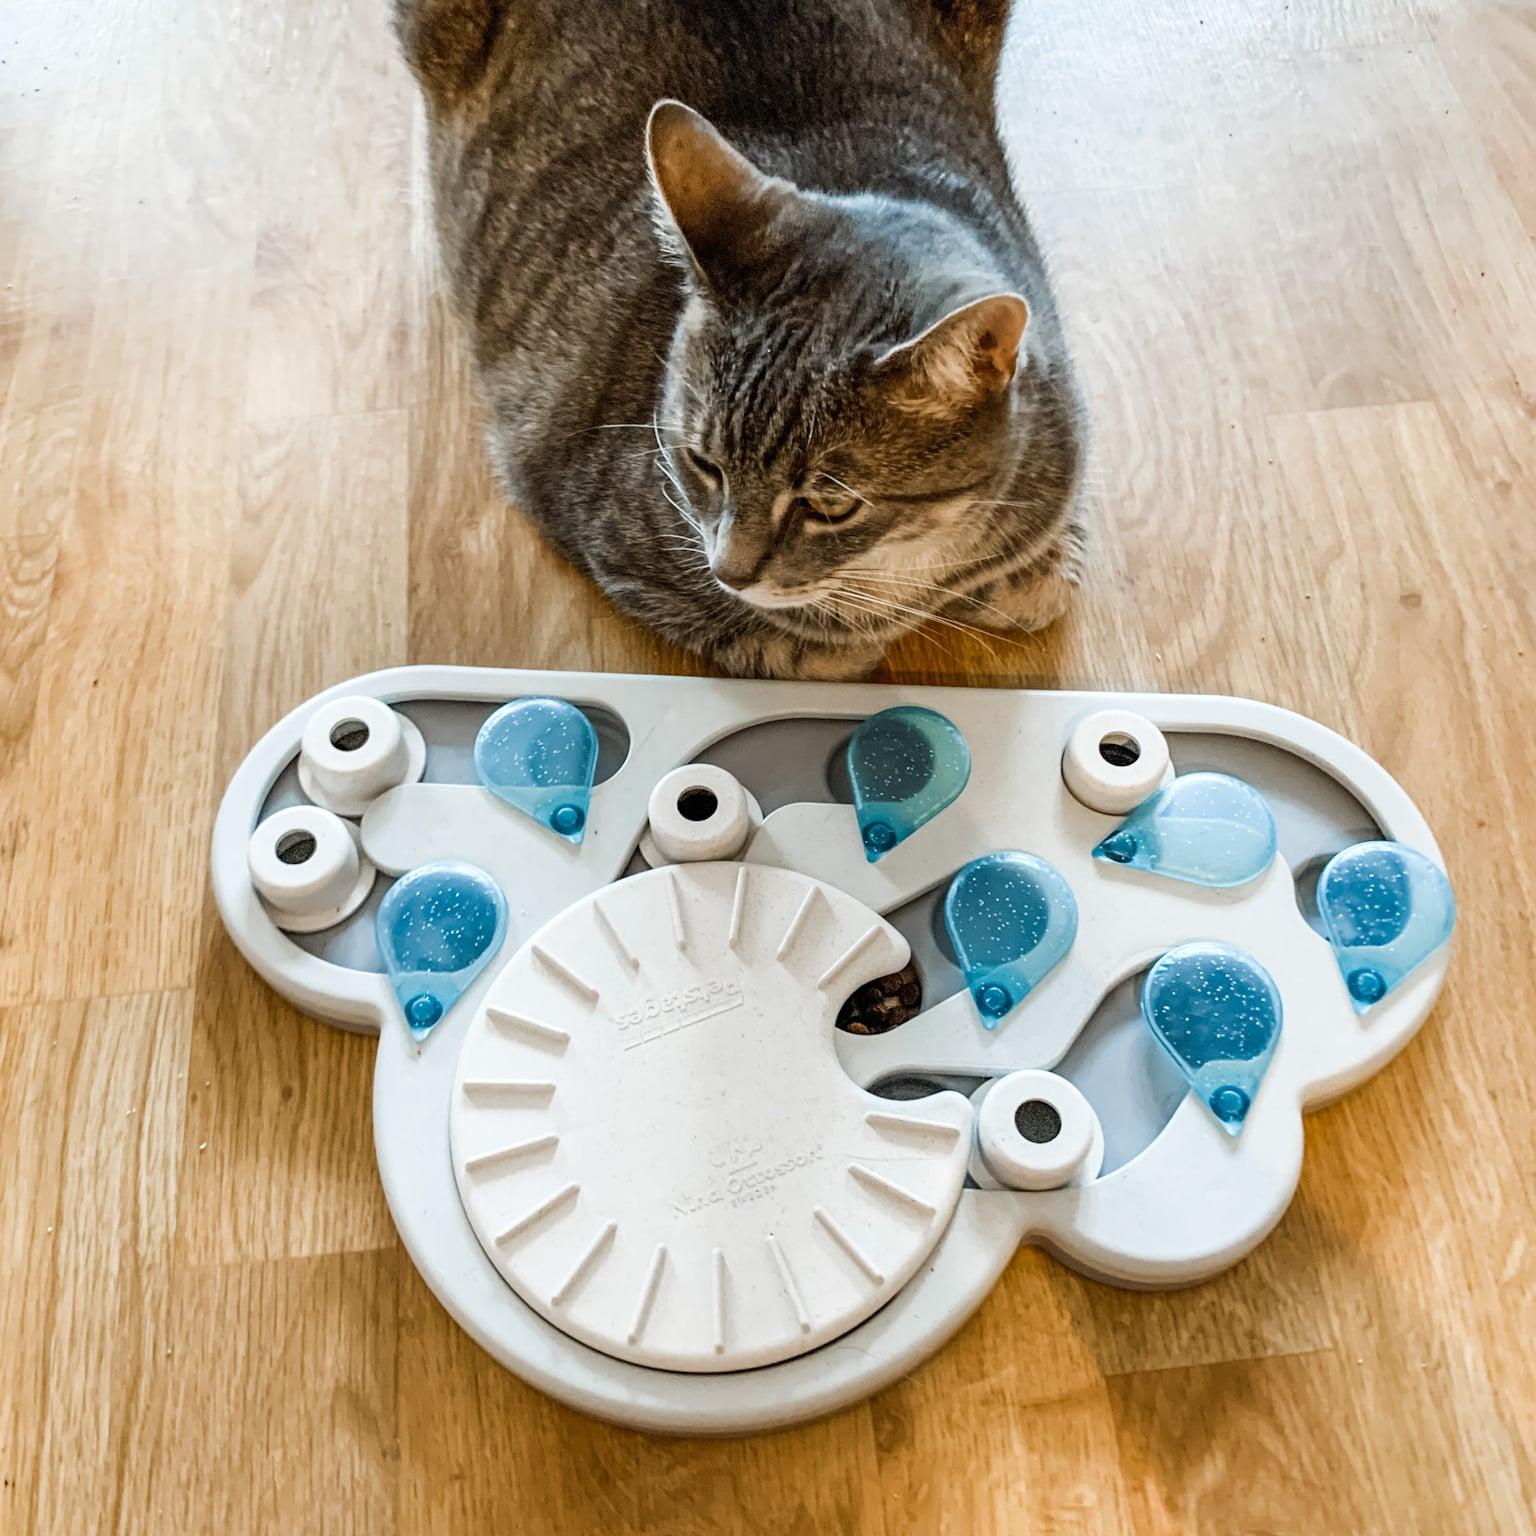 Cat Slow Feeder Puzzle Review Petstages Rainy Day Popsugar Pets